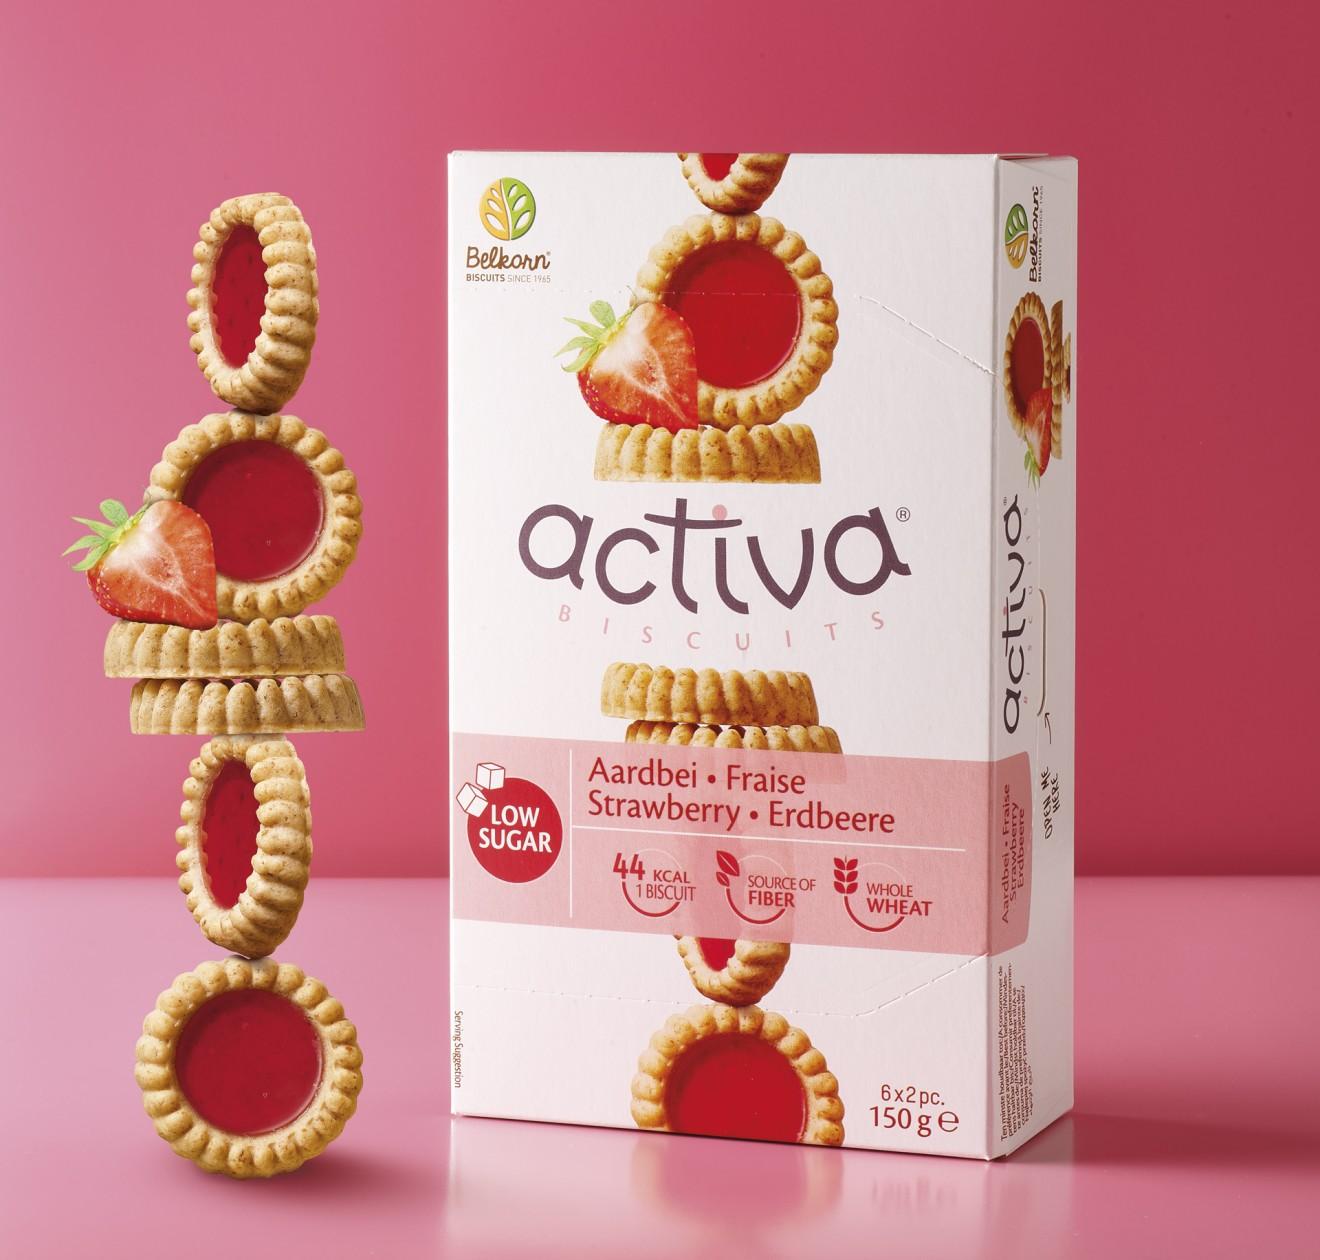 Quatre Mains package design - low sugar, wellbeing, strawberry